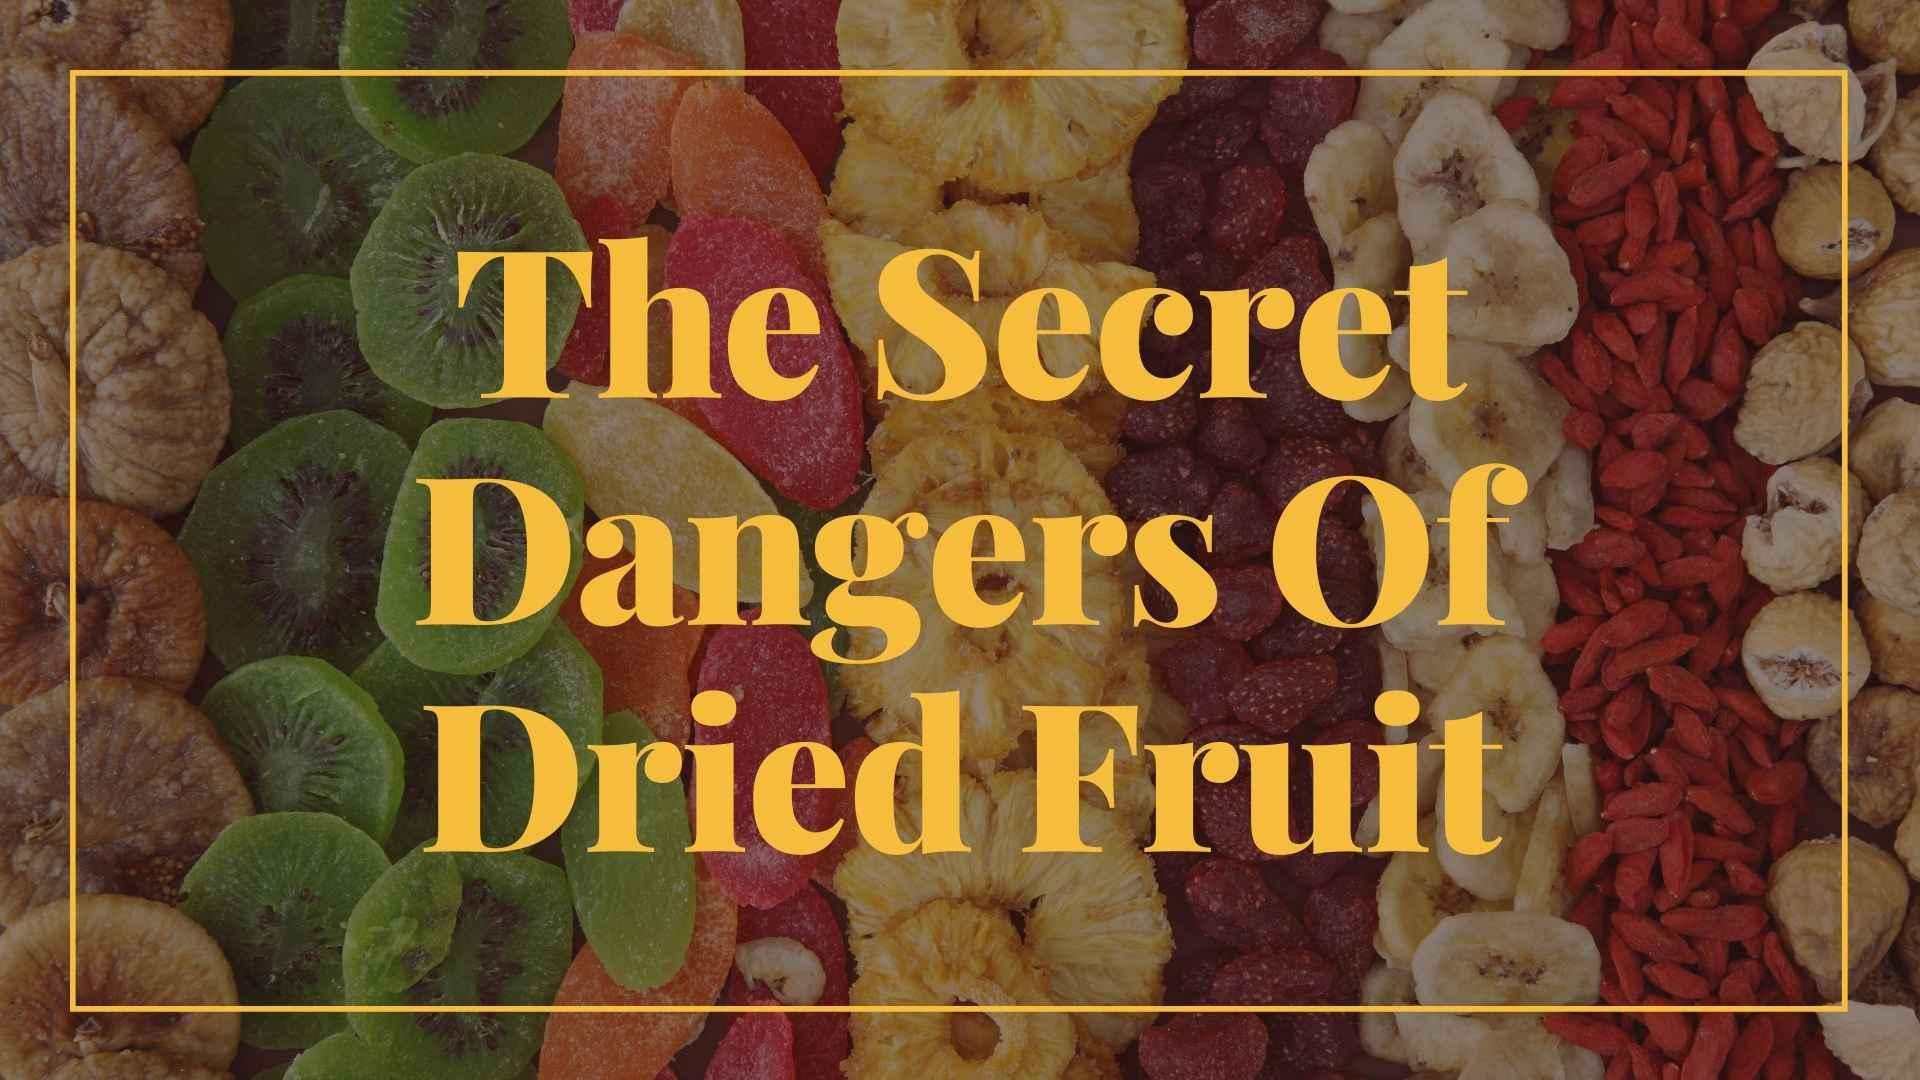 The Secret Dangers Of Dried Fruit